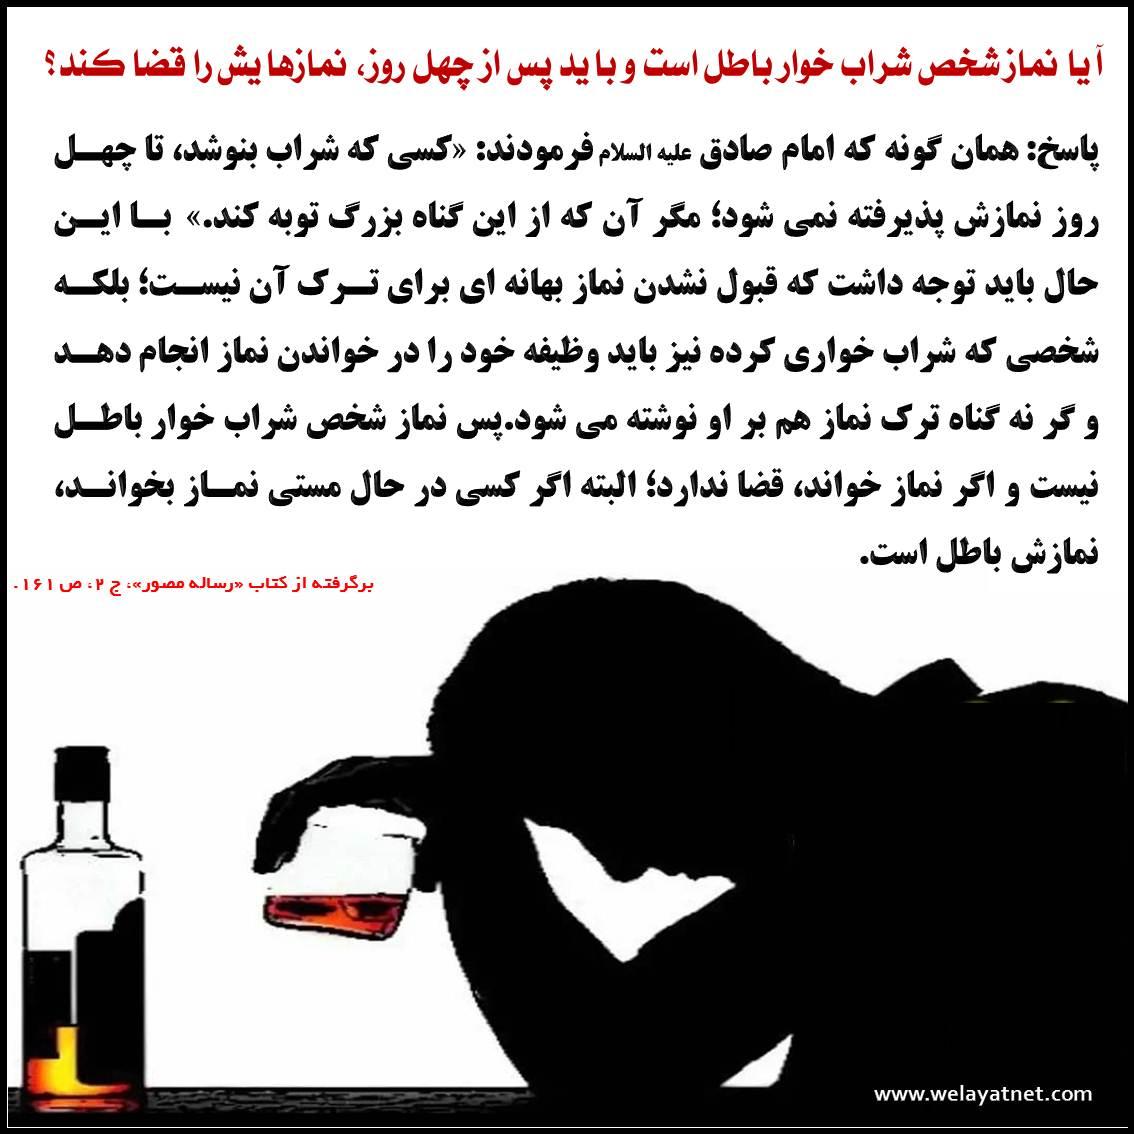 نماز، شراب، نجس